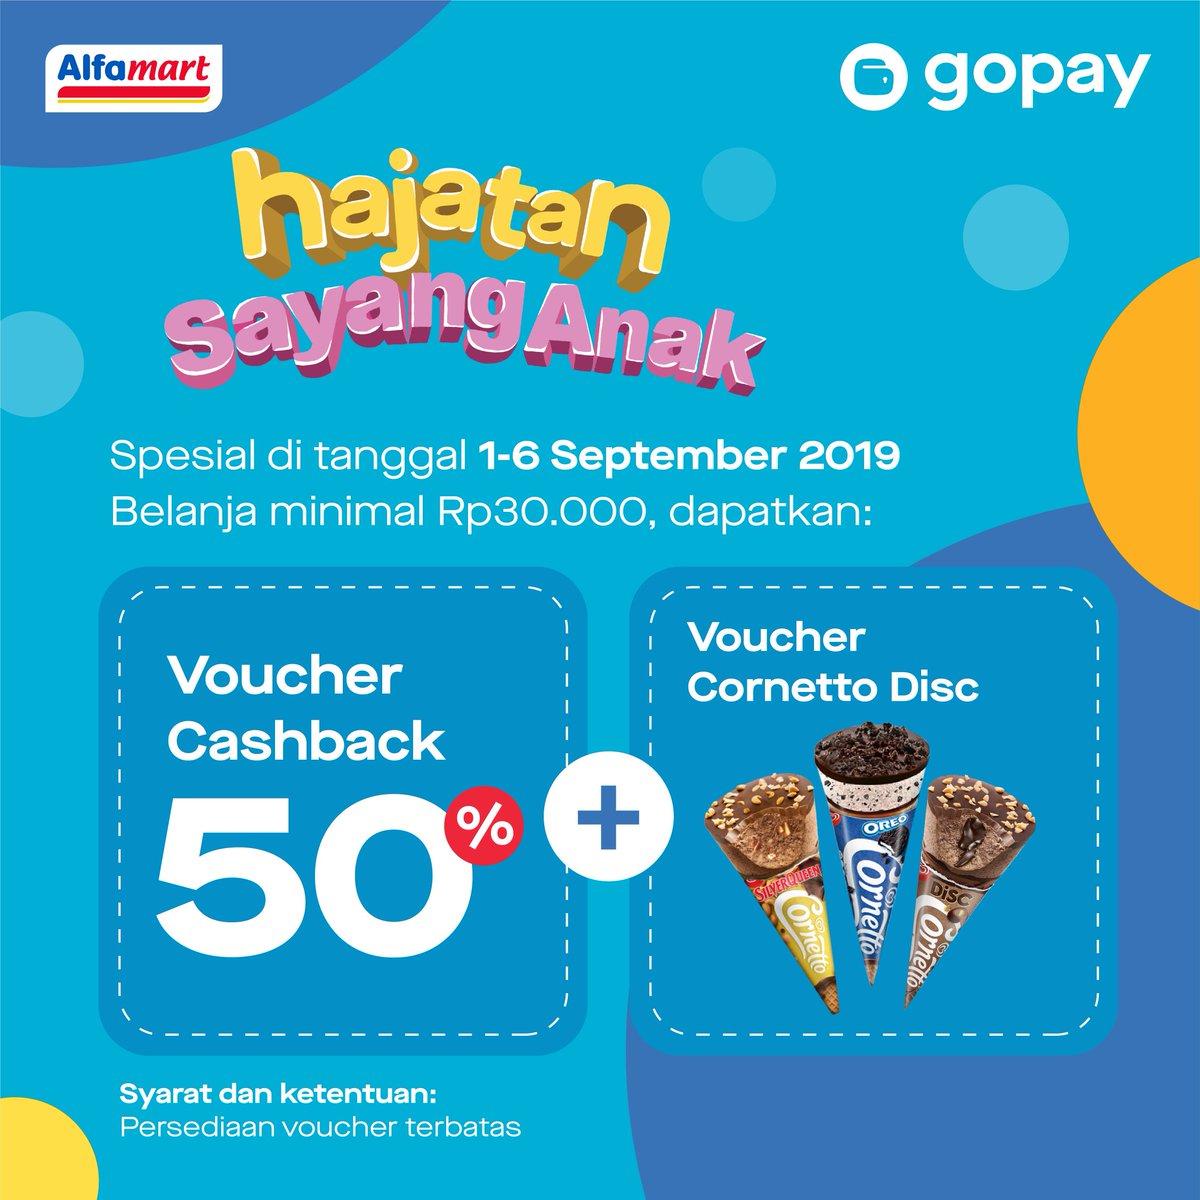 GoPay Indonesia (@gopayindonesia) | Twitter